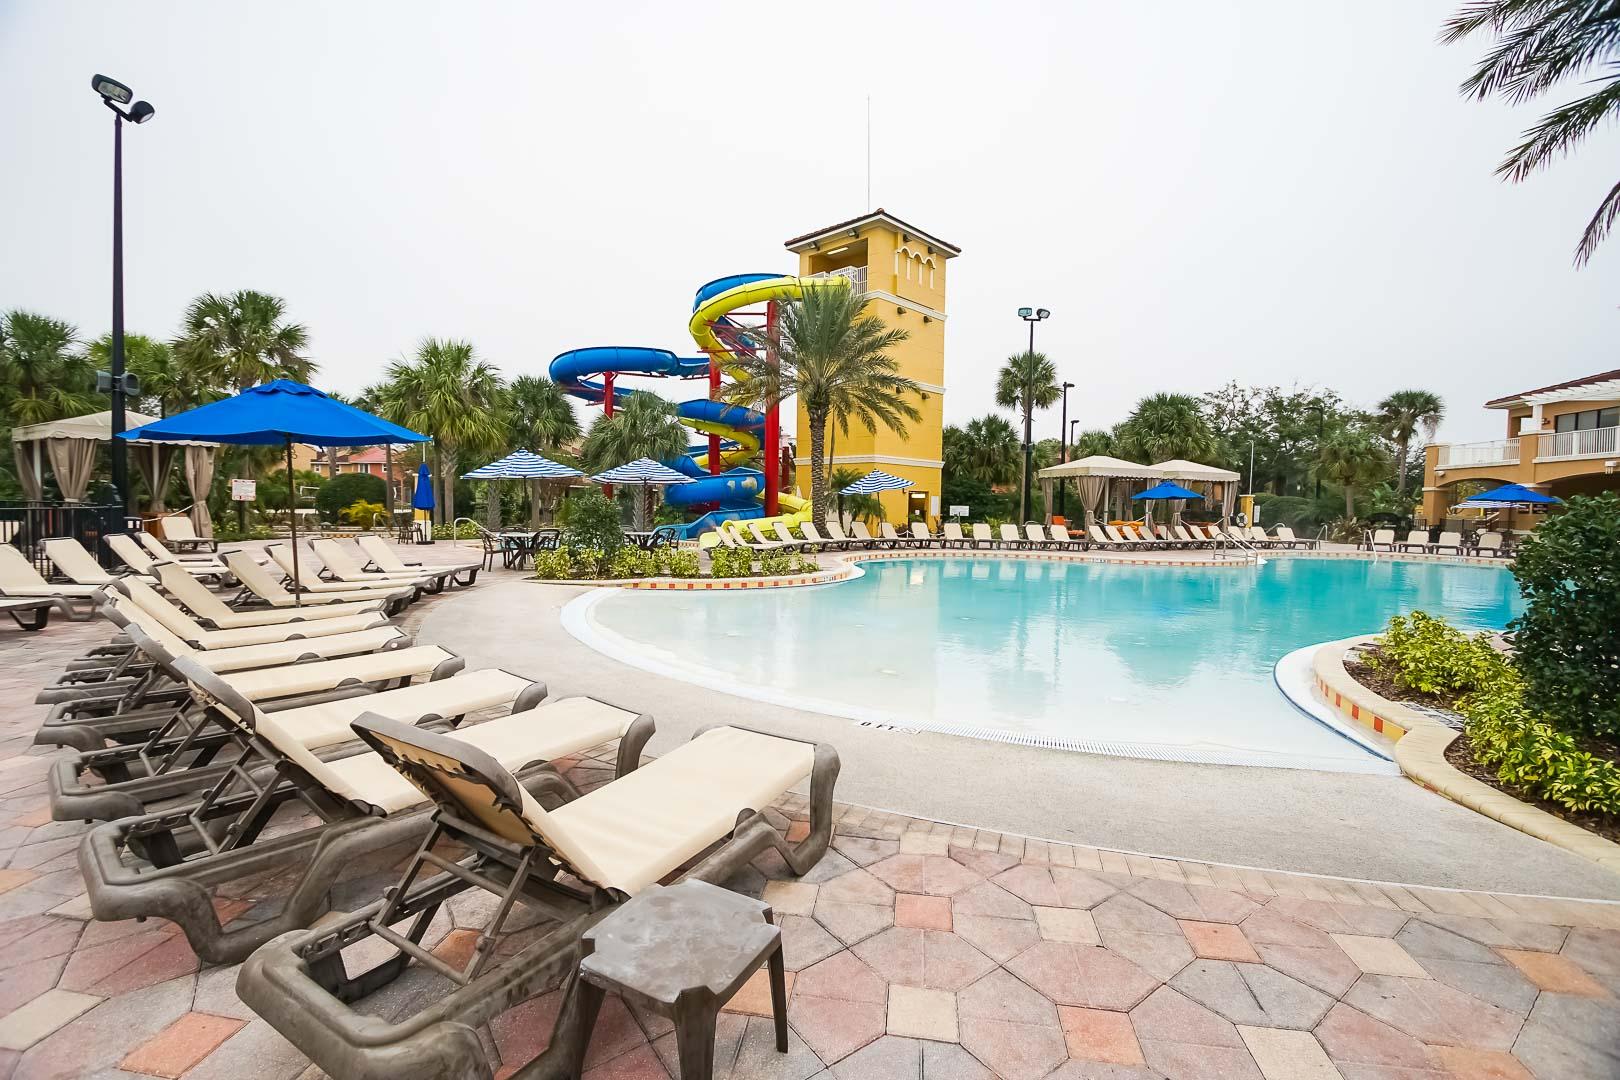 A fun filled water-slide at VRI's Fantasy World Resort in Florida.